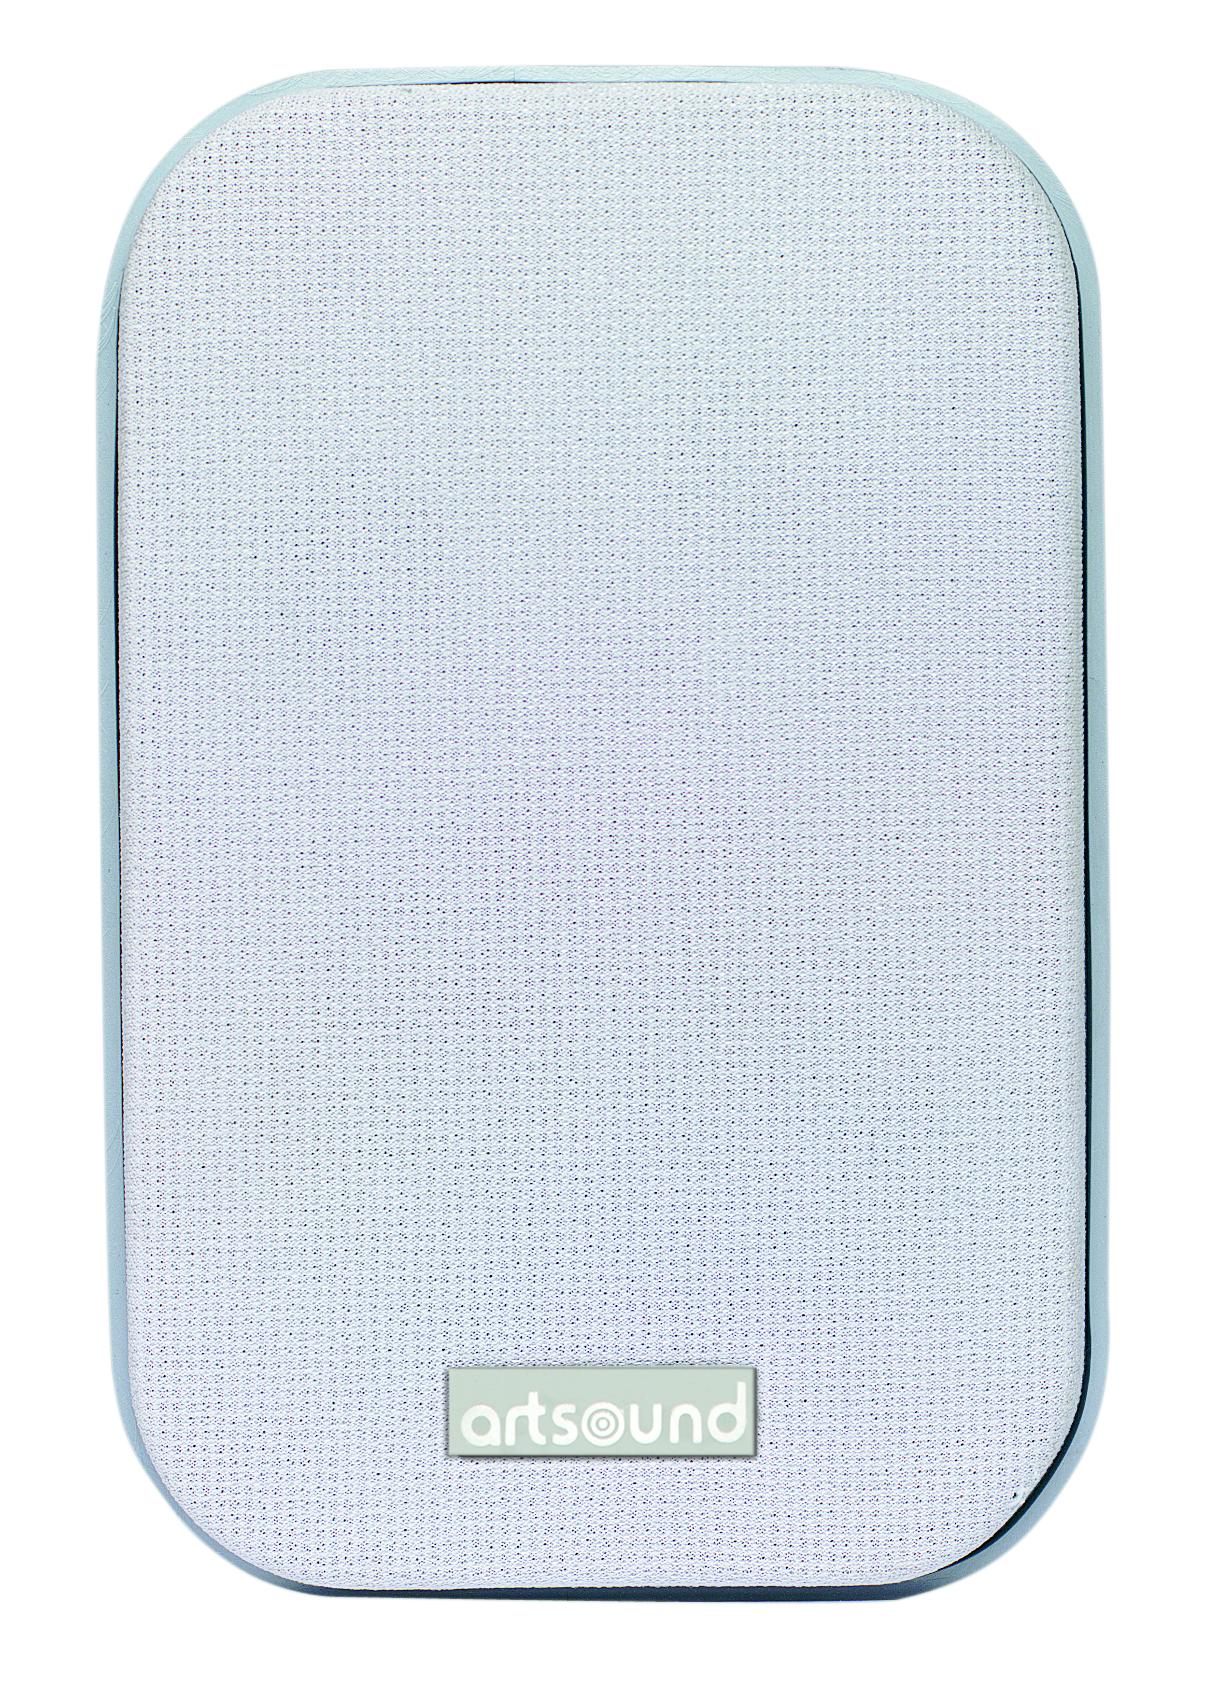 AS30, basic, 2-way onwall loudspeaker, 100W, grey (2pc)